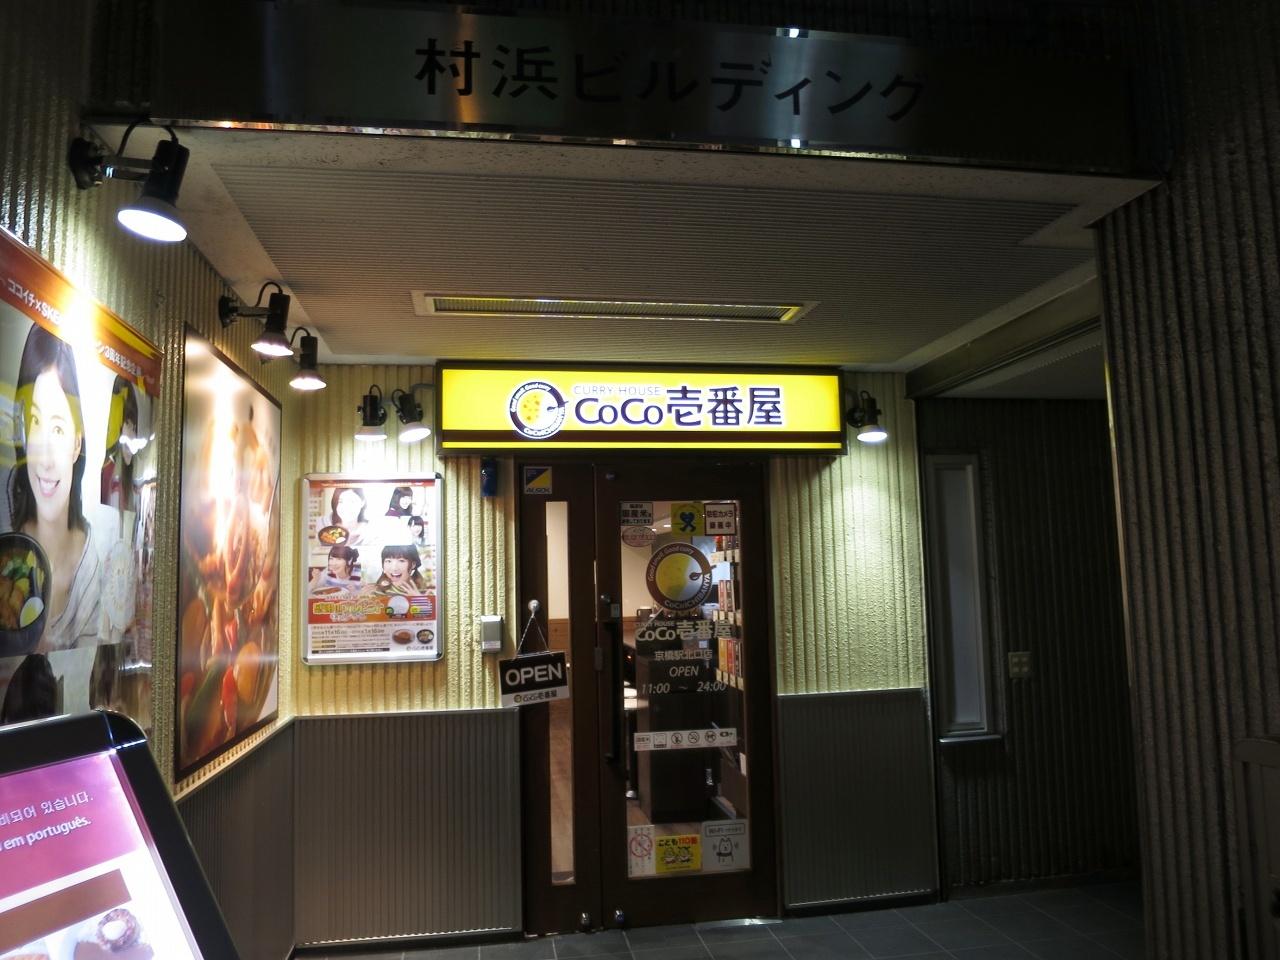 CoCo壱番屋 京橋駅北口店